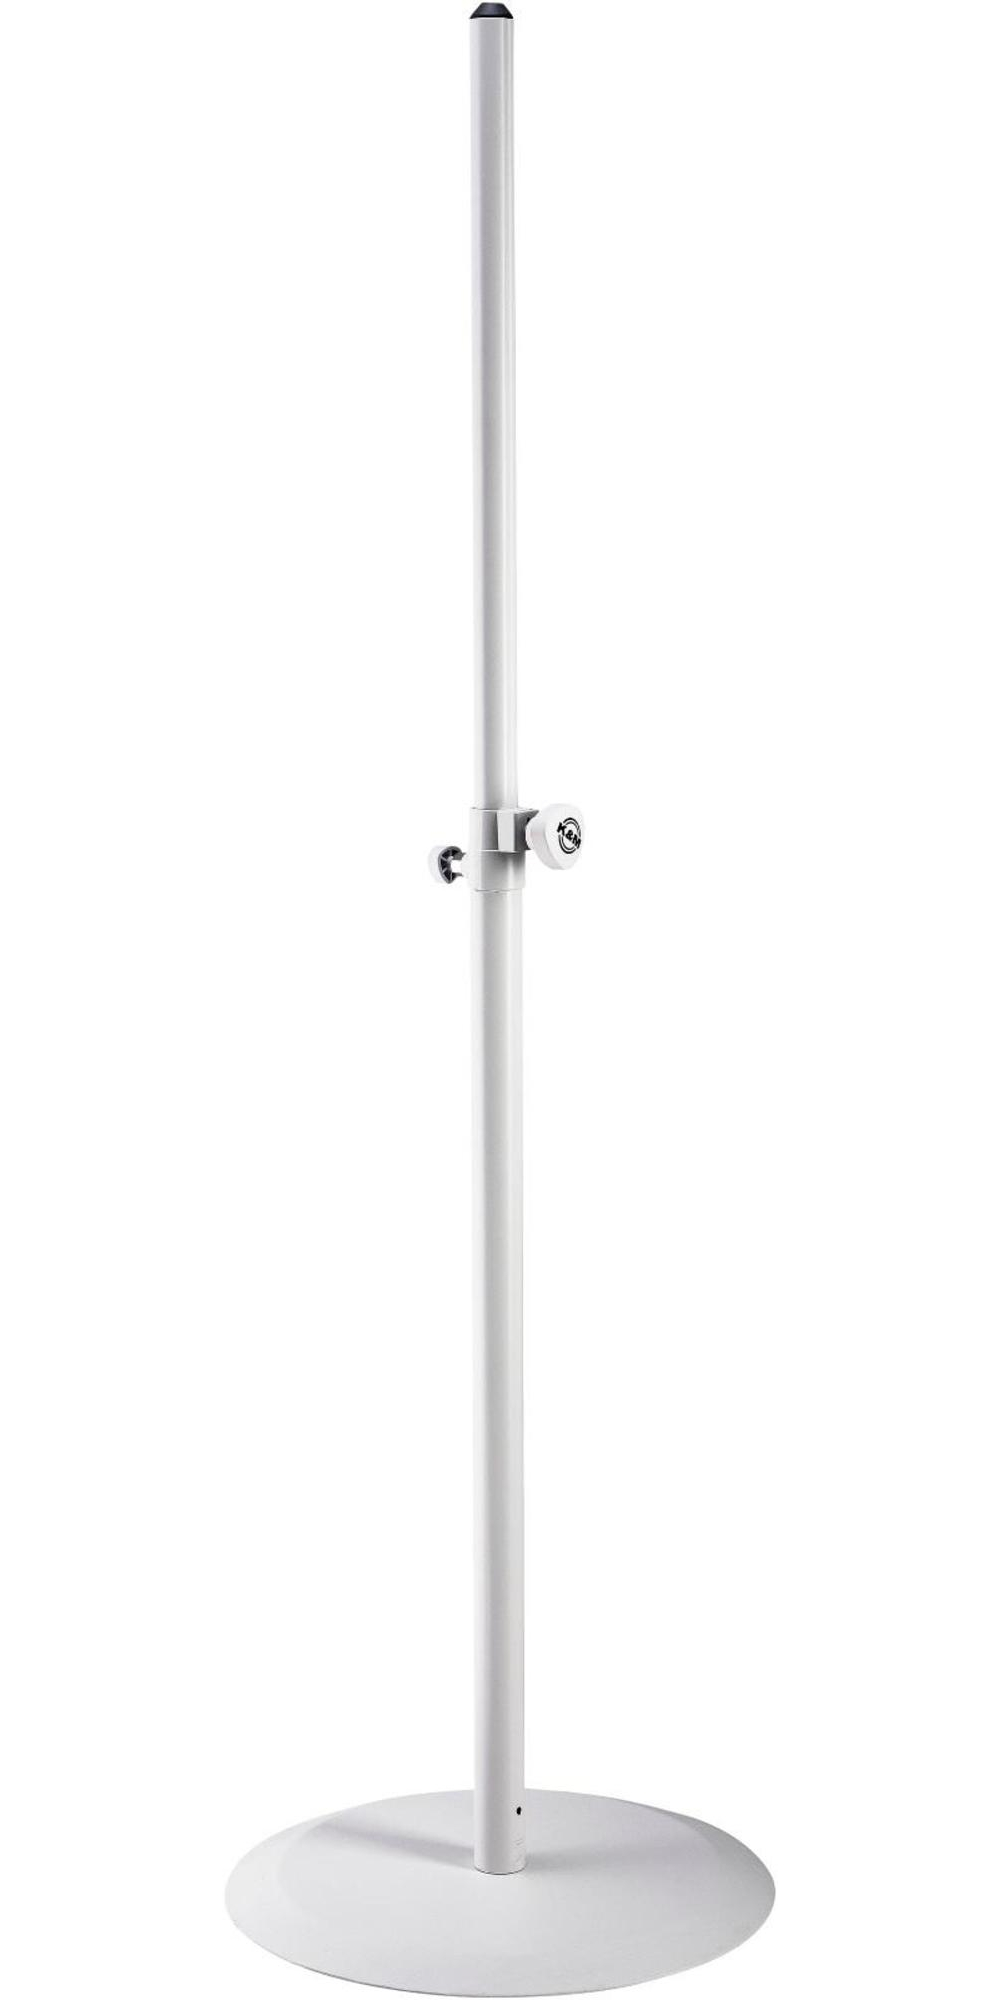 K&M 26735.000.76 White Round Base Speaker Stand by K&M